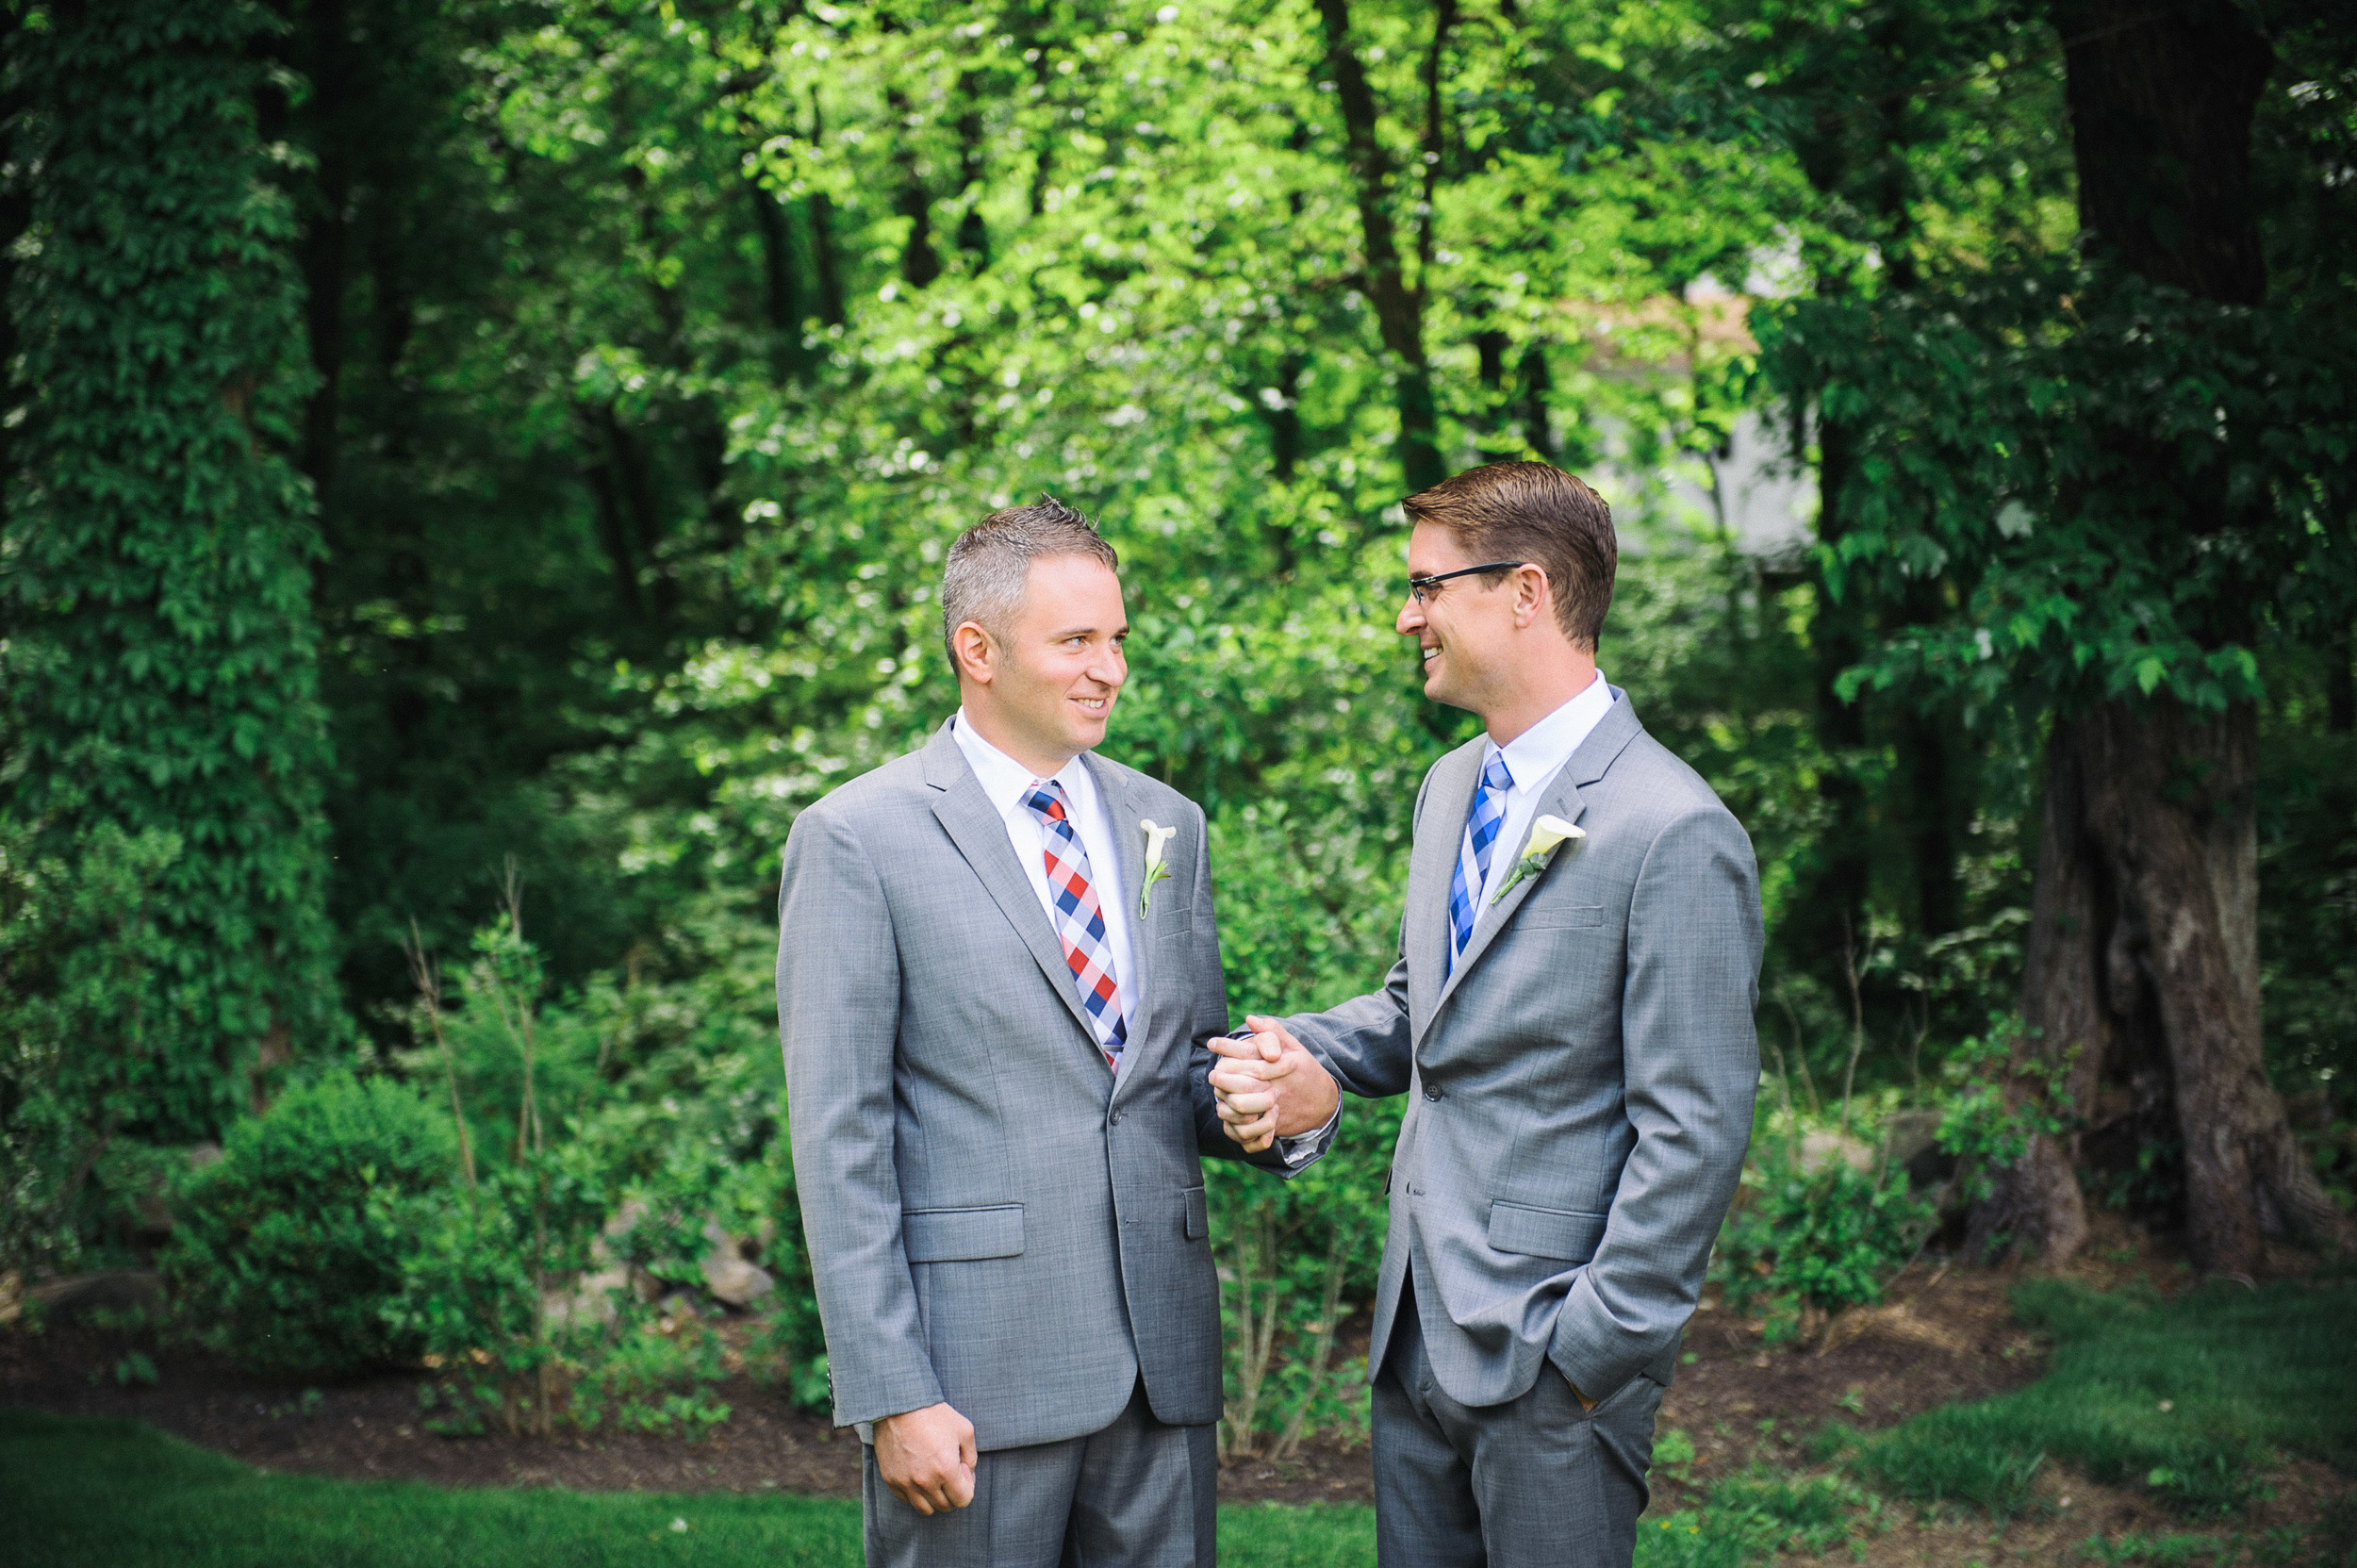 Same Sex Wedding CT Gay Wedding LGBT Wedding250.JPG